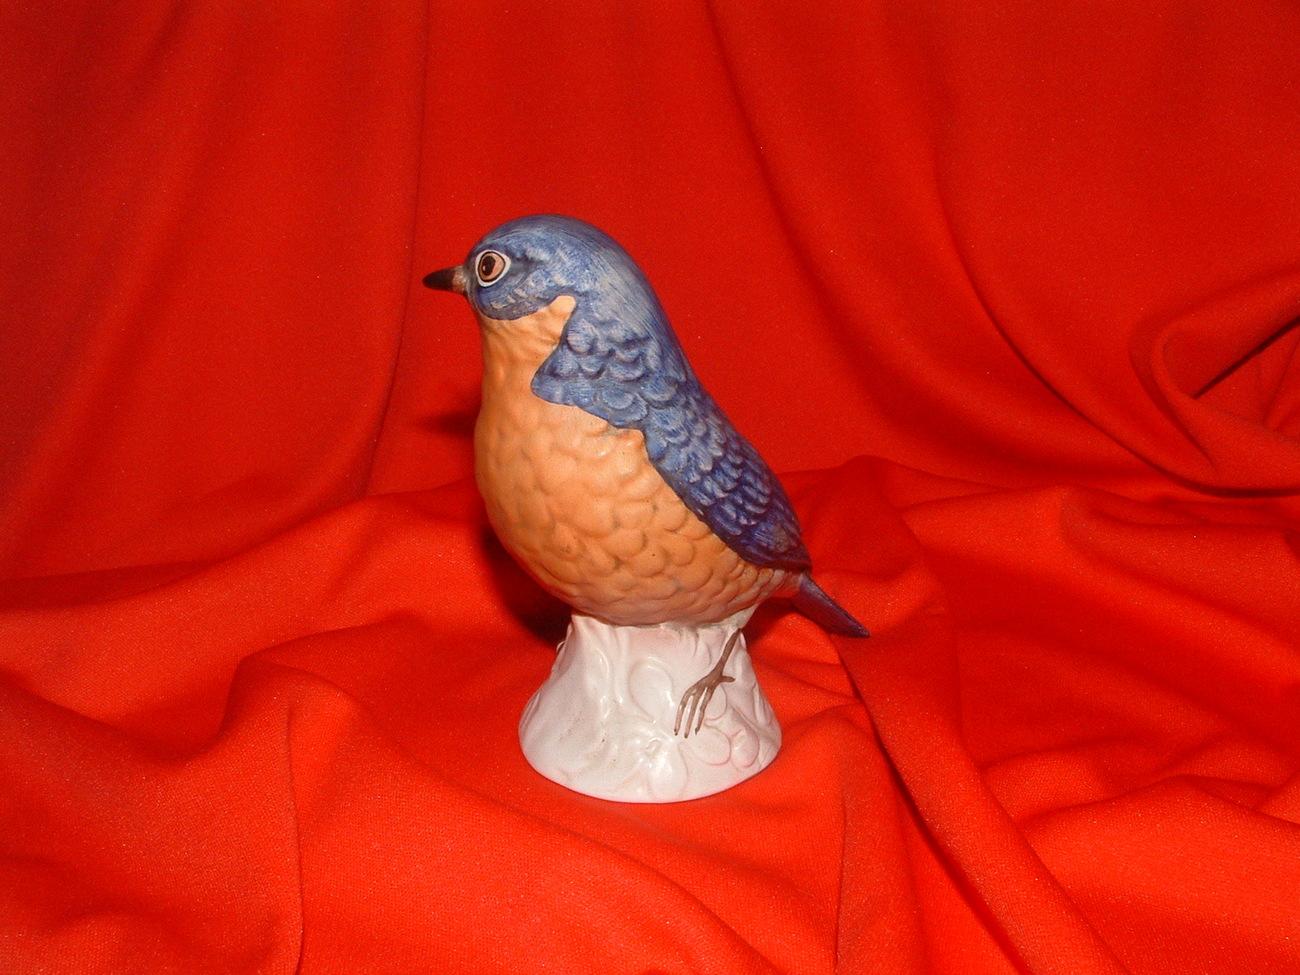 HUMMEL / GOEBEL # 38 575 TMK 5 BIRD FIGURINE